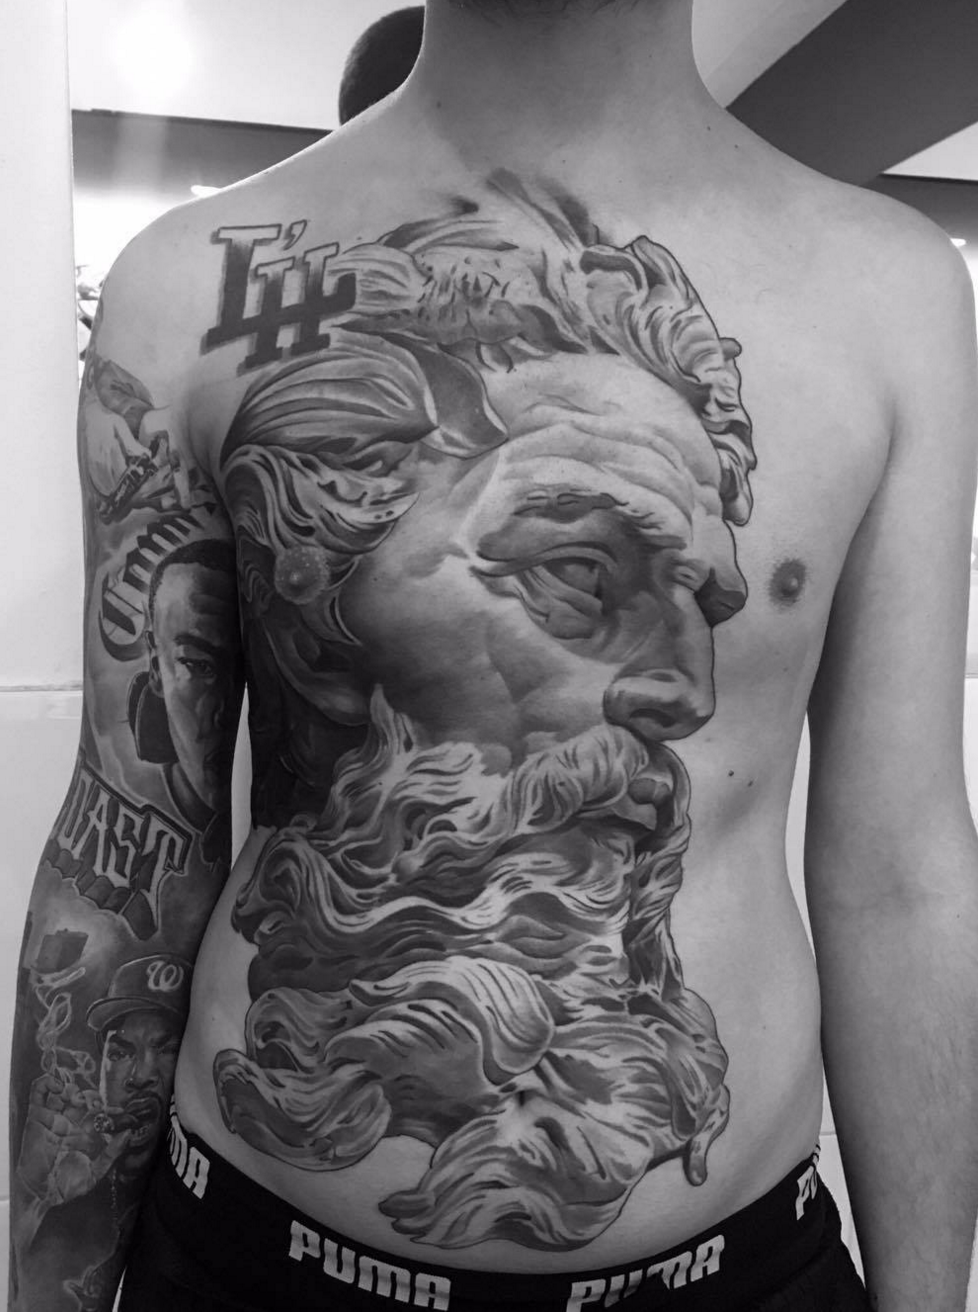 Jose bandera boston tattoo convention for Tattoo artists boston